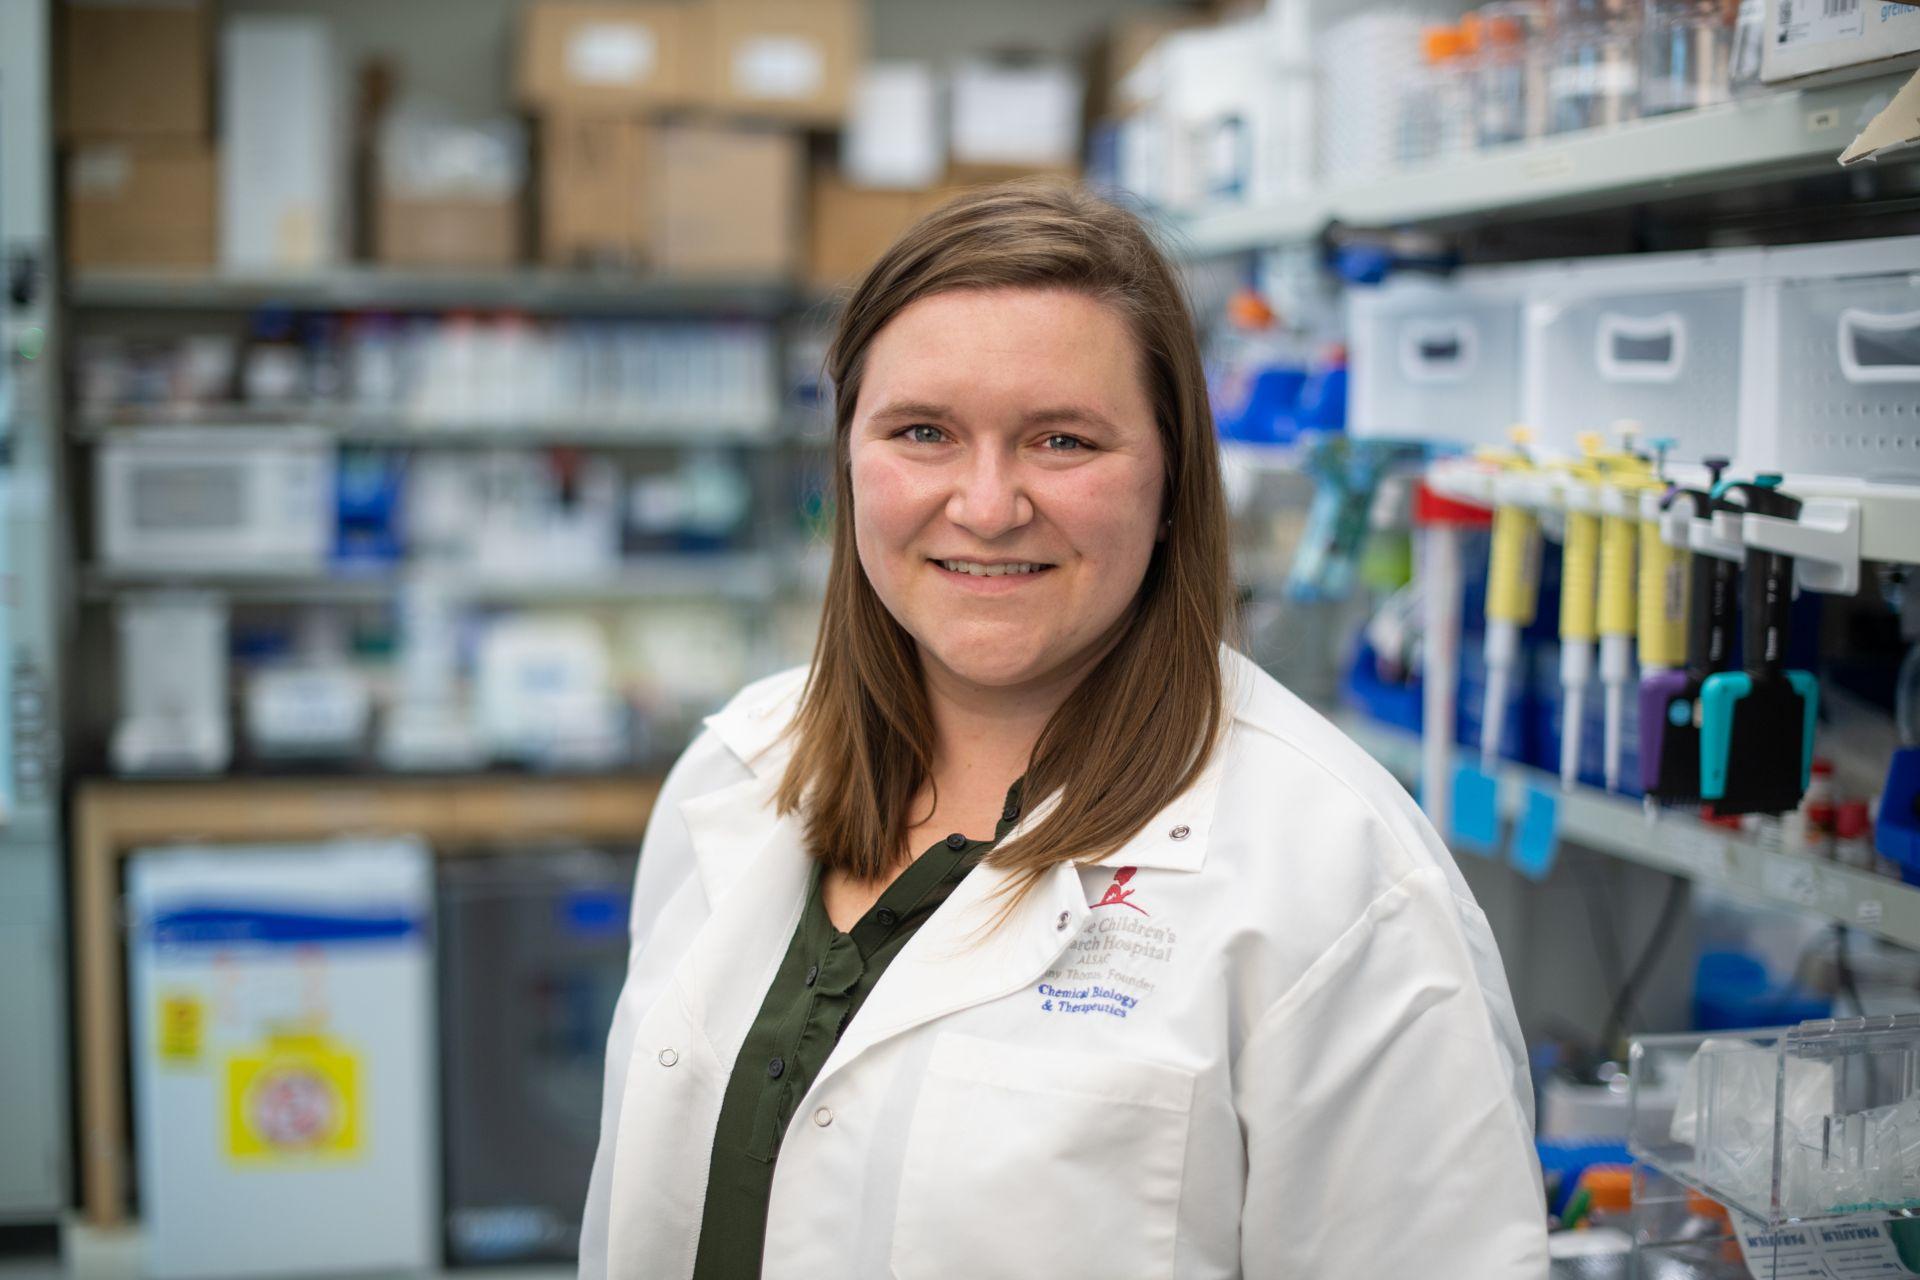 Stephanie Reeve, PhD